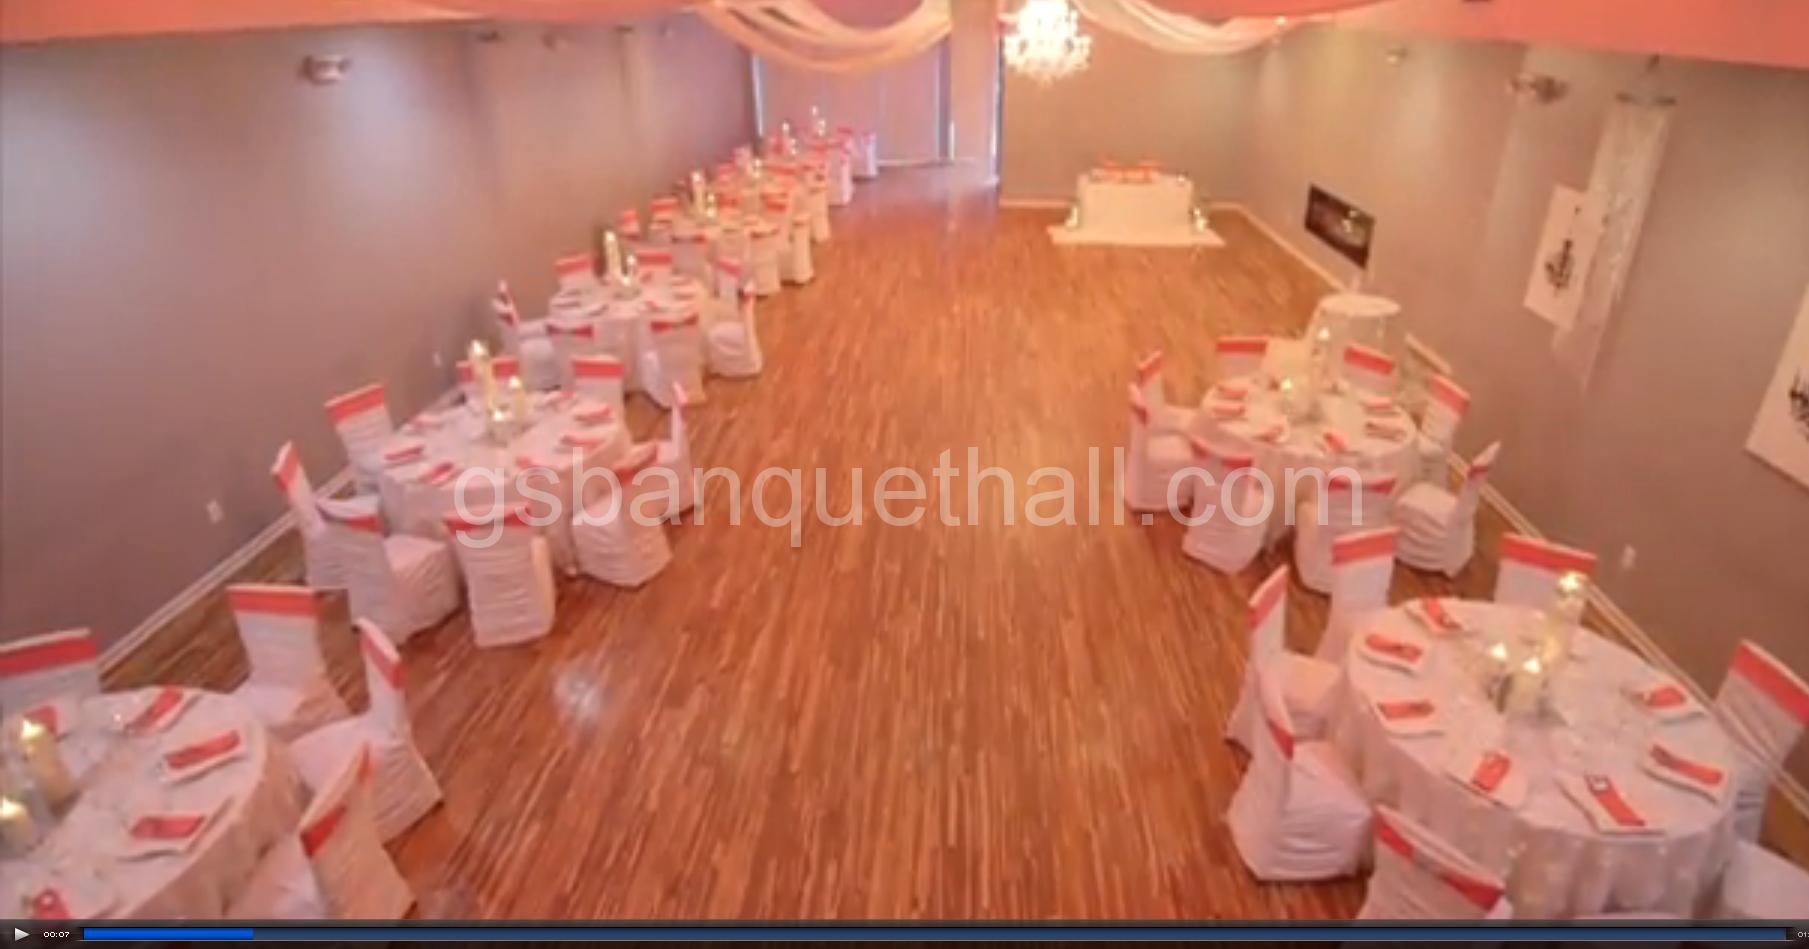 Beautiful Gs Banquet Hall